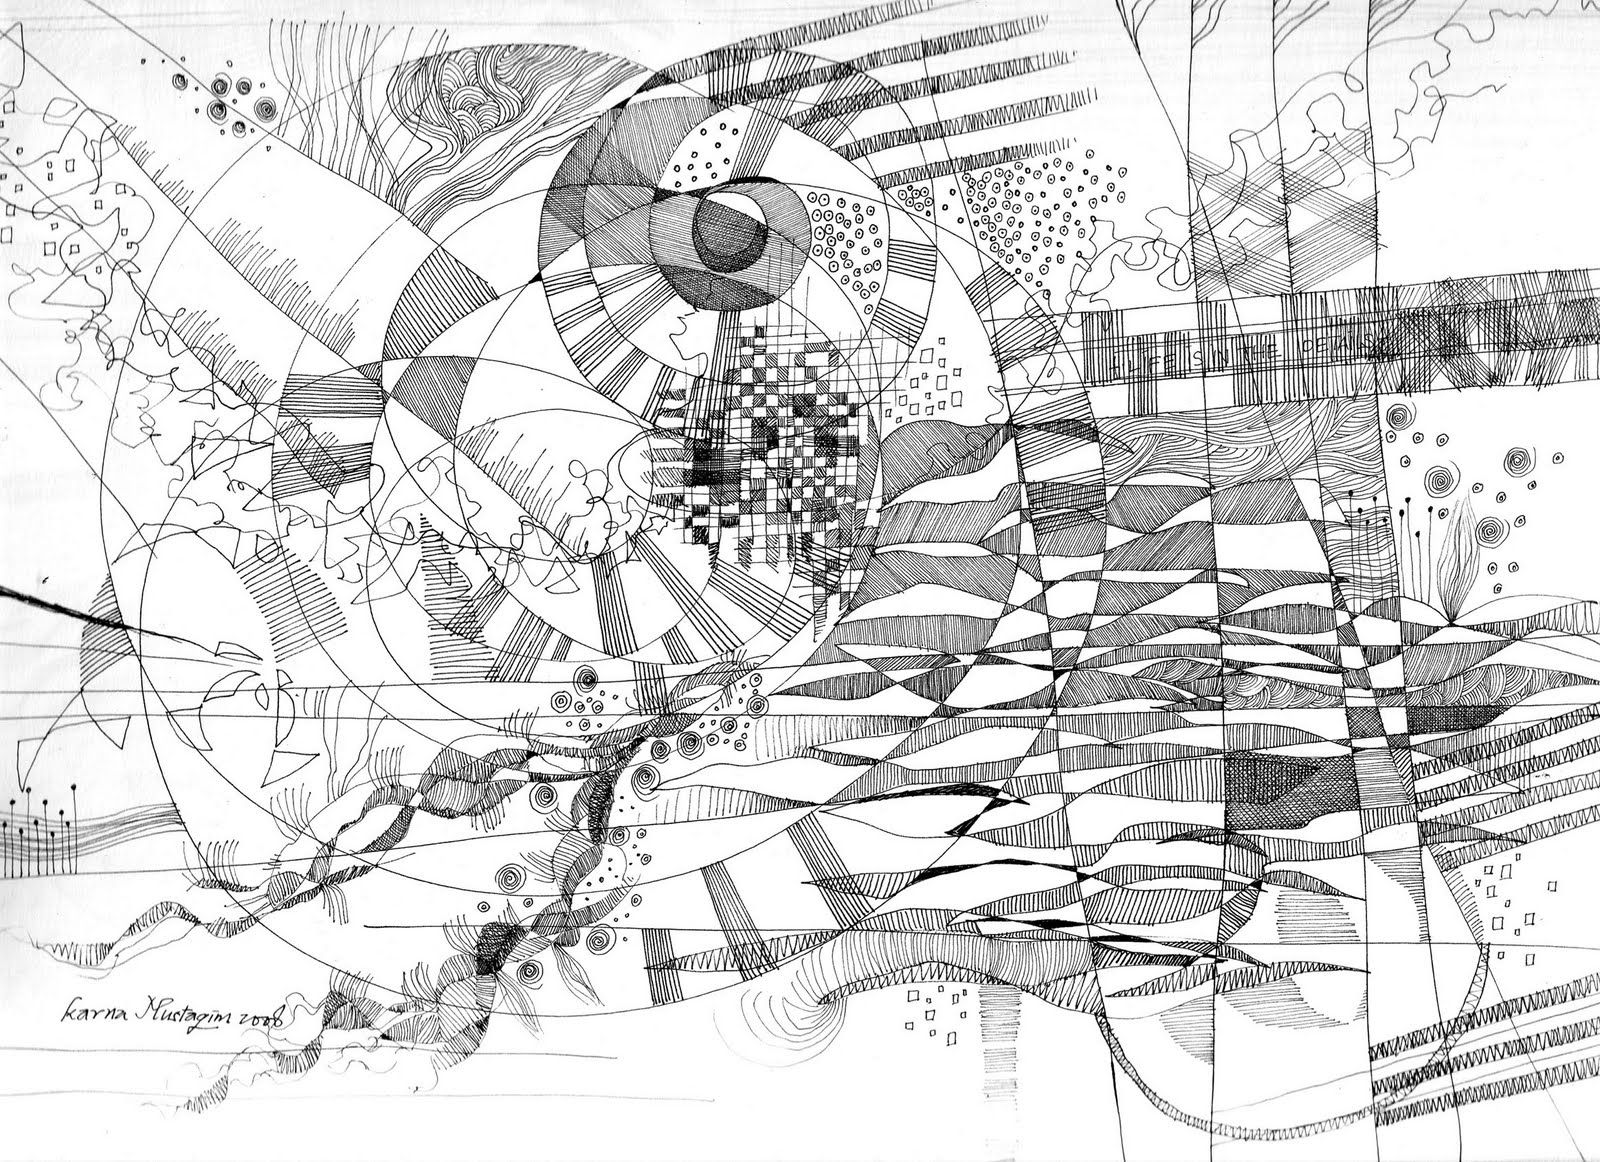 Google Image Result for http://3.bp.blogspot.com/_g4TB1Mif8no/TCjb5SvHH5I/AAAAAAAAB08/I5dvEBL8x3k/s1600/karnaInDeLineOfDrawing_08small.jpg